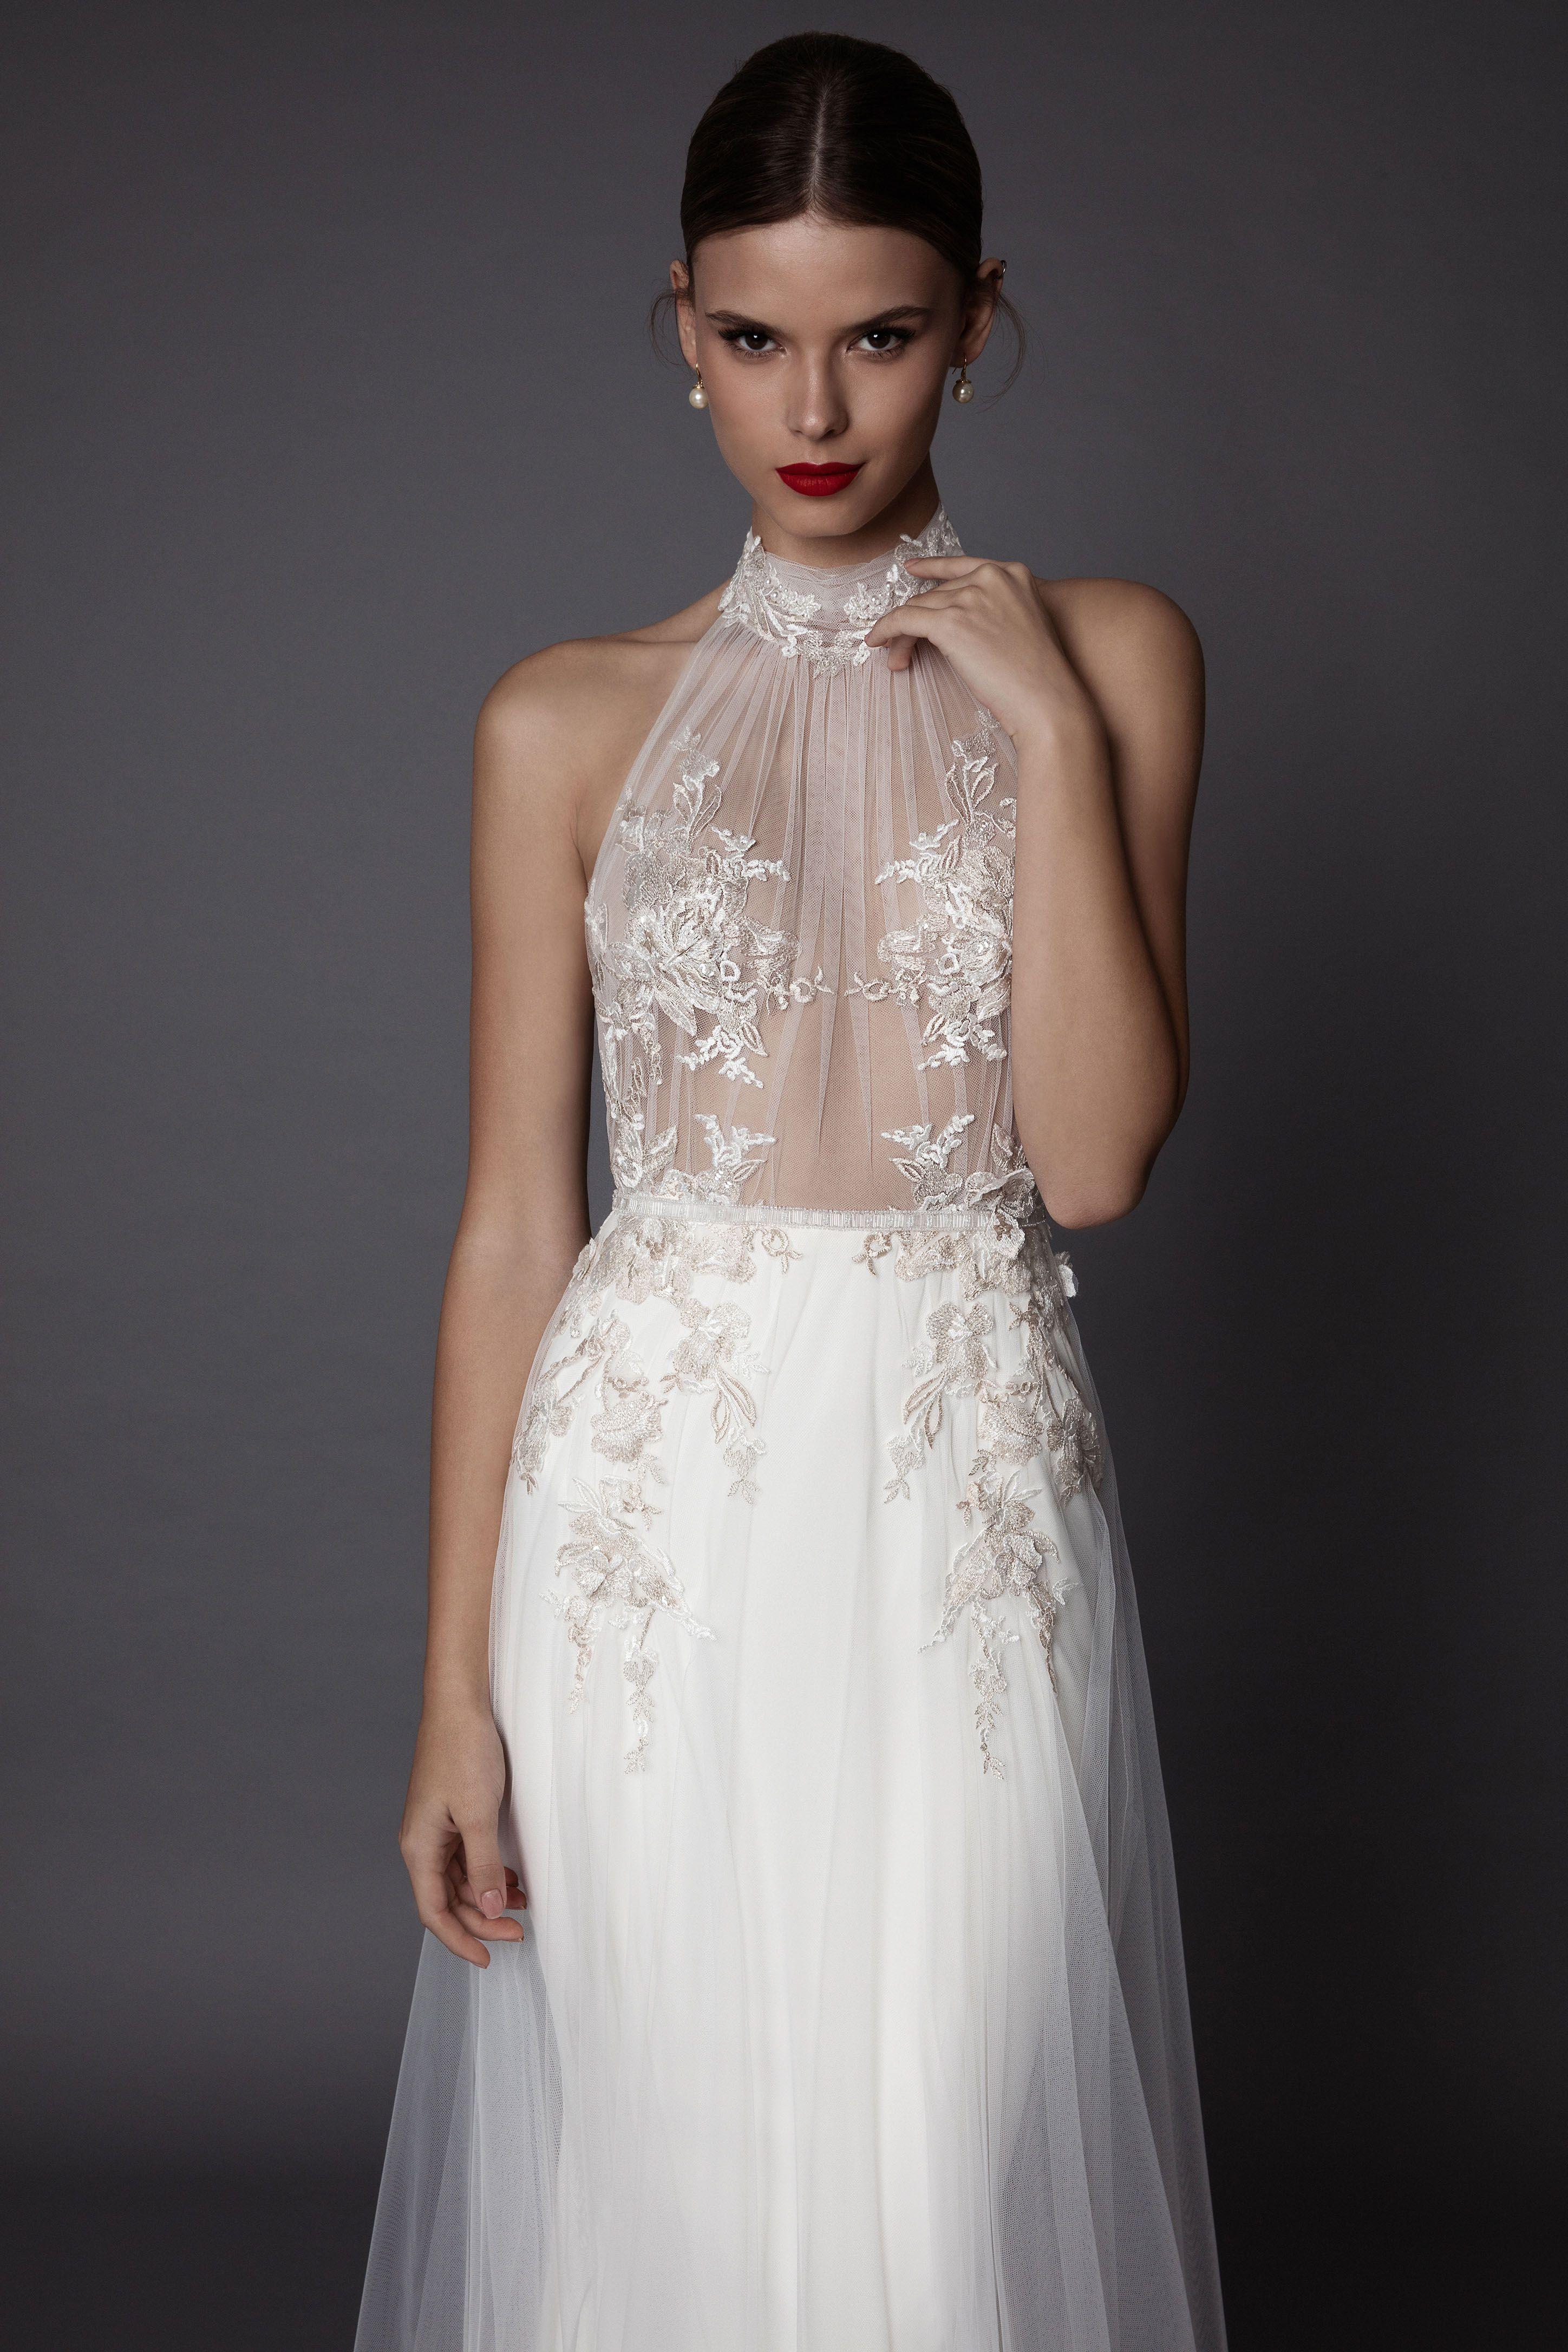 Summer White High Neck Berta Wedding Dresses 2018 Illusion Applique Lace Sweep Train Beach Bohemian Wedding Dress Subtle Irish Bridal Gown